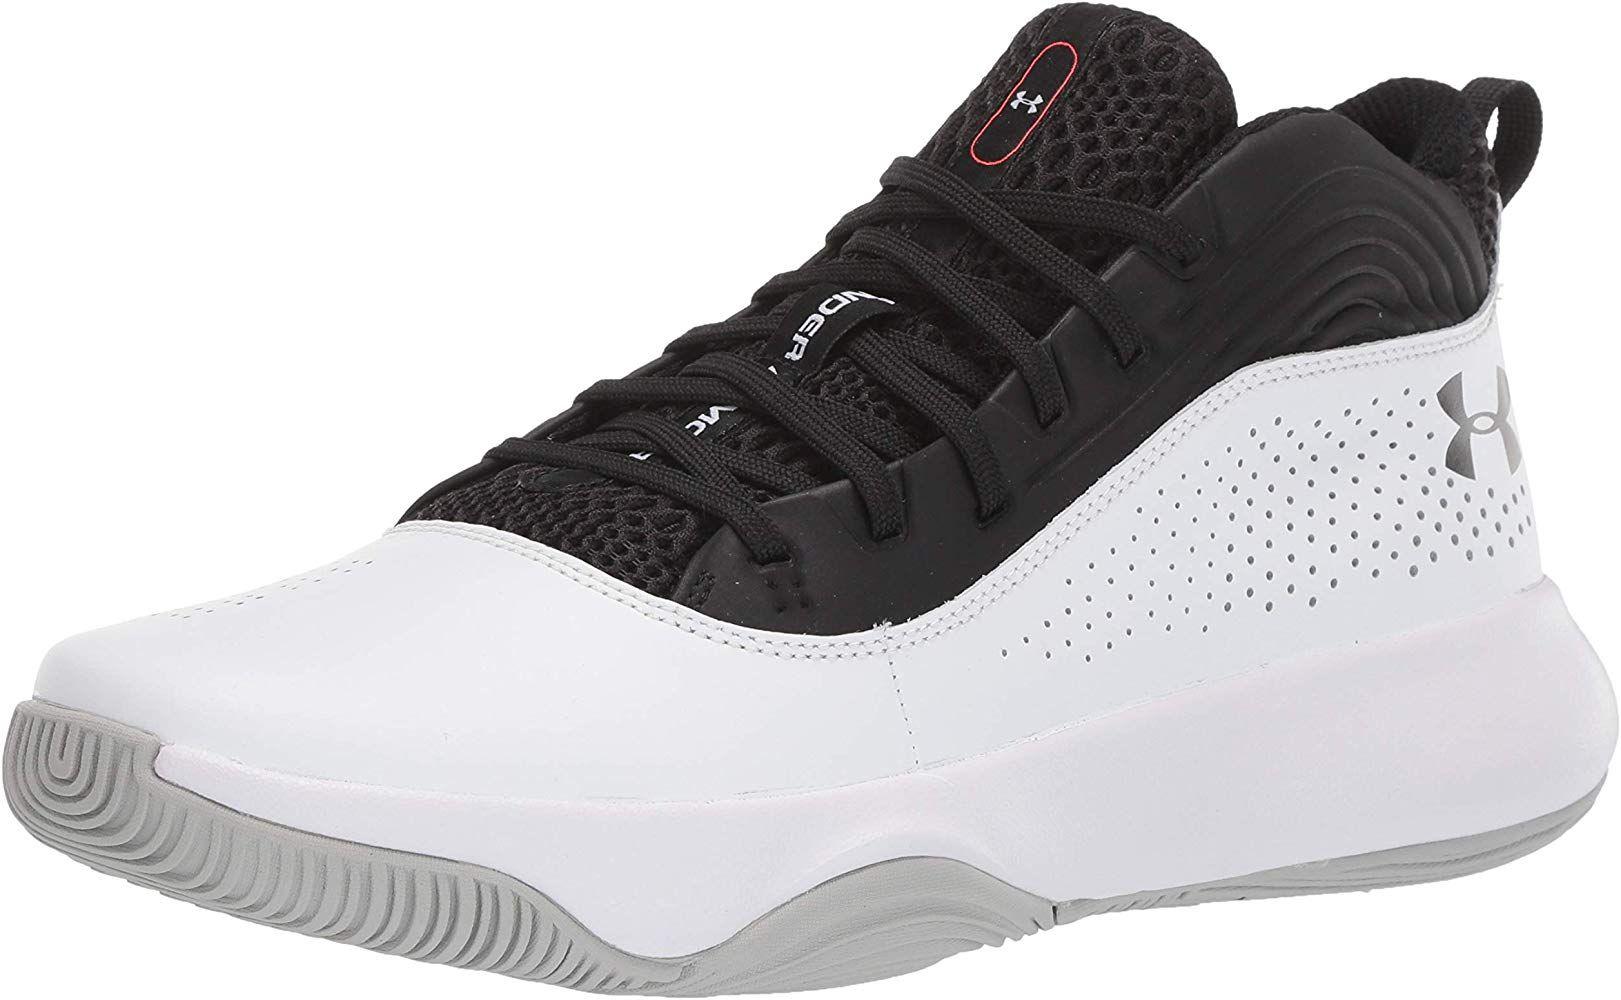 Chaussures de Basketball Homme Under Armour UA Lockdown 3